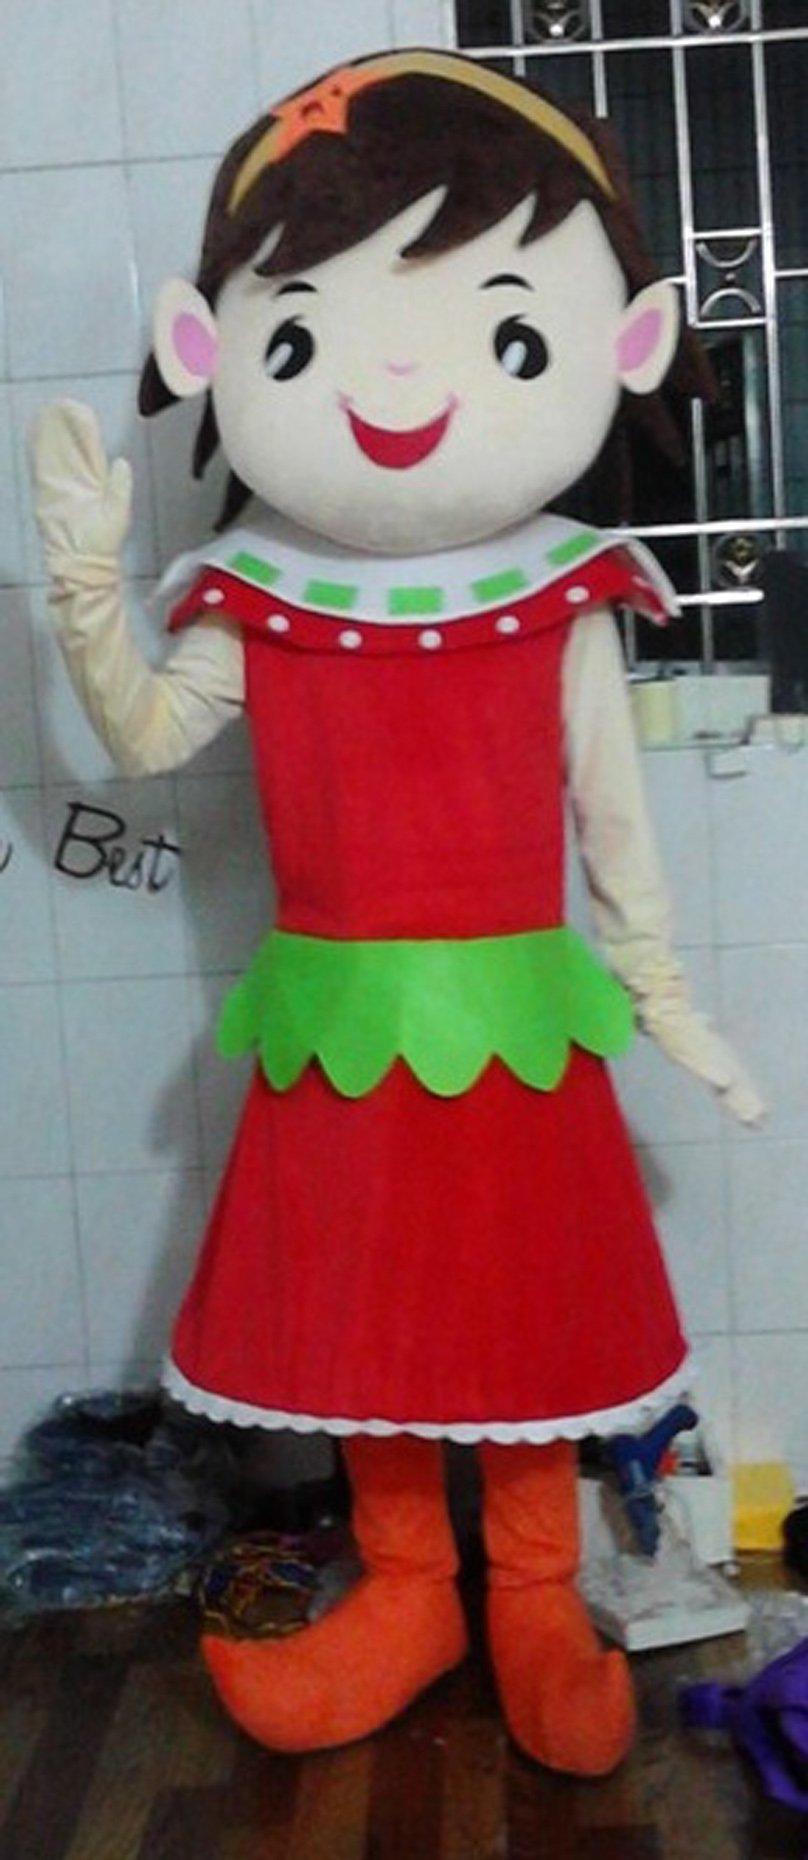 Cos Clothing Animation Cartoon Show Beautiful Dress Red Dress Walking Cartoon Dolls Performances Mascot Costume